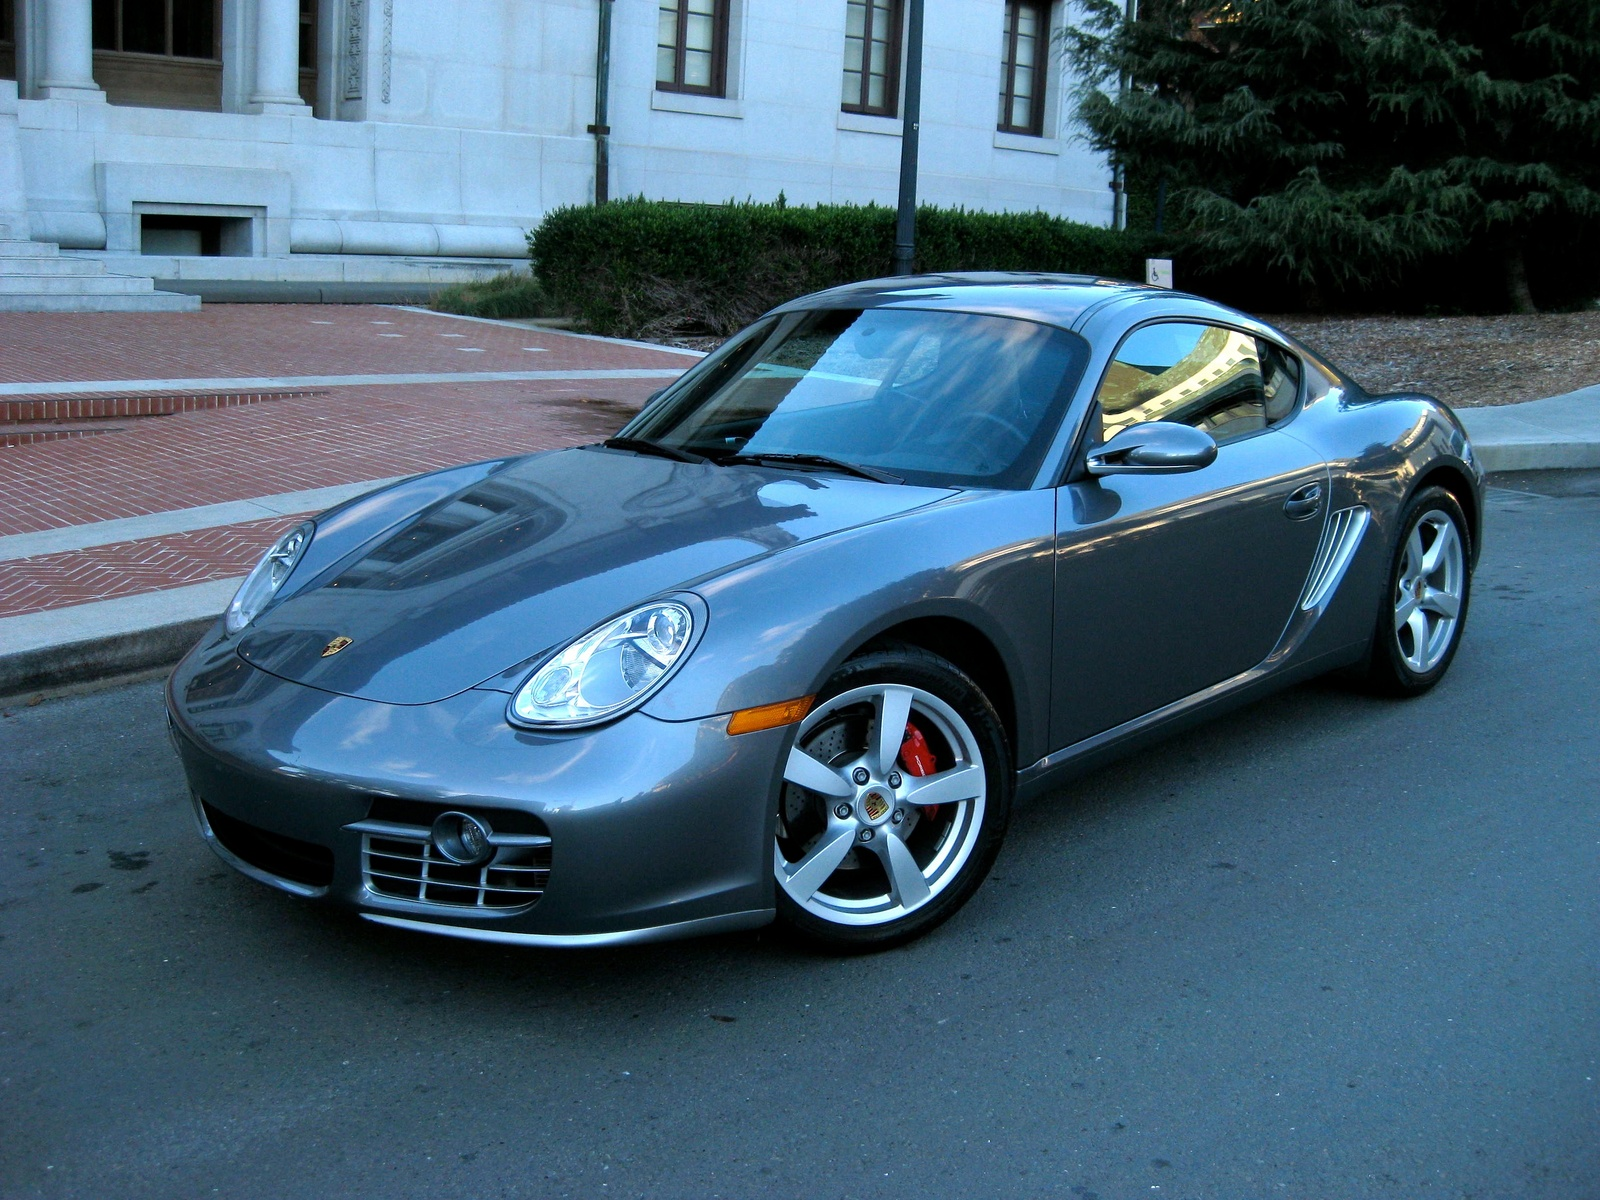 2007 Porsche Cayman Exterior Pictures Cargurus